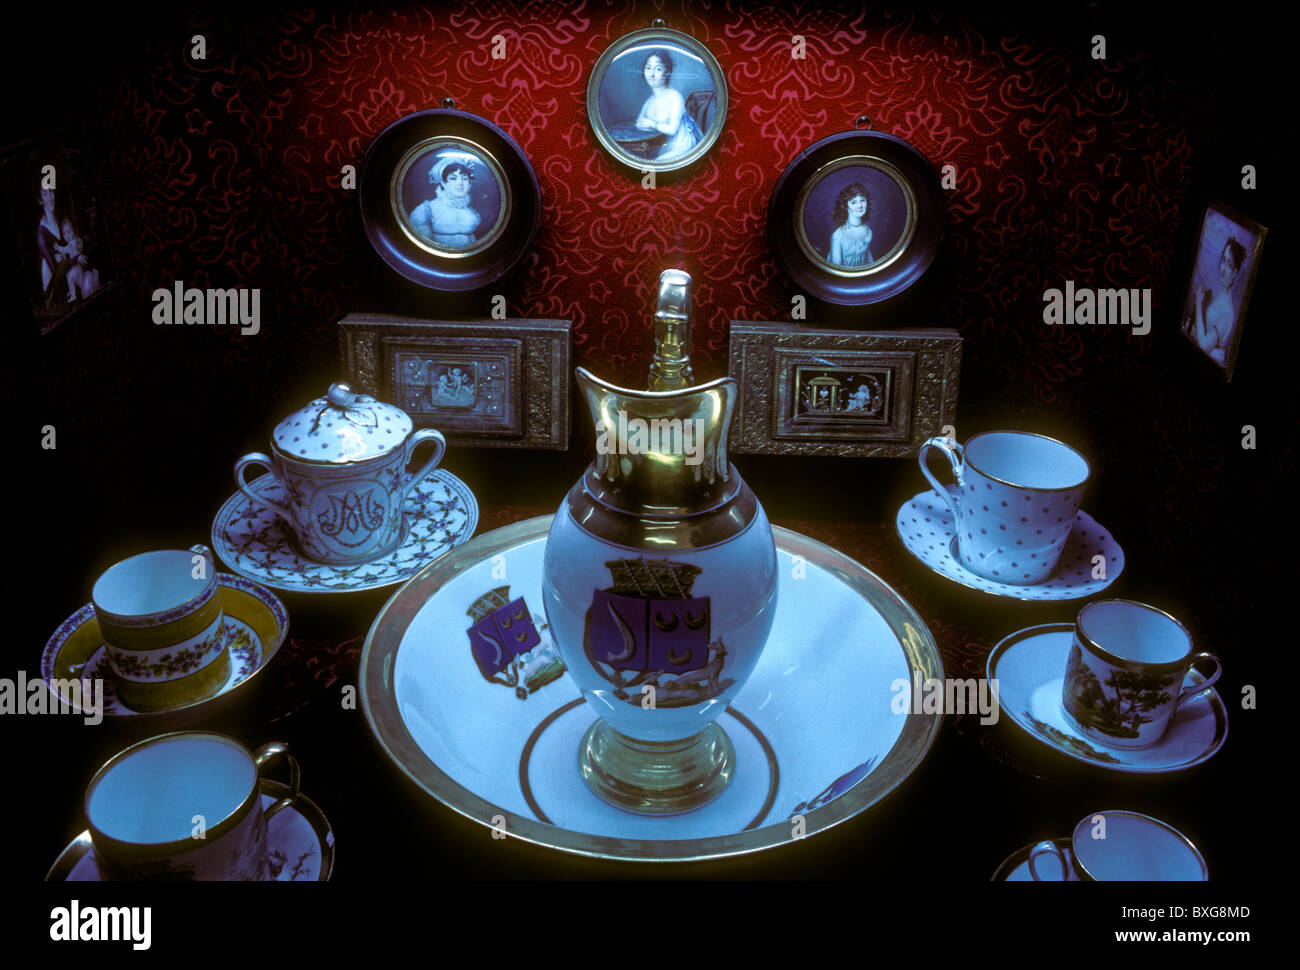 porcelain, porcelain pitcher, porcelain bowl, porcelain teacup, circa 1781, Lorrain Historical Museum, city of Nancy, - Stock Image